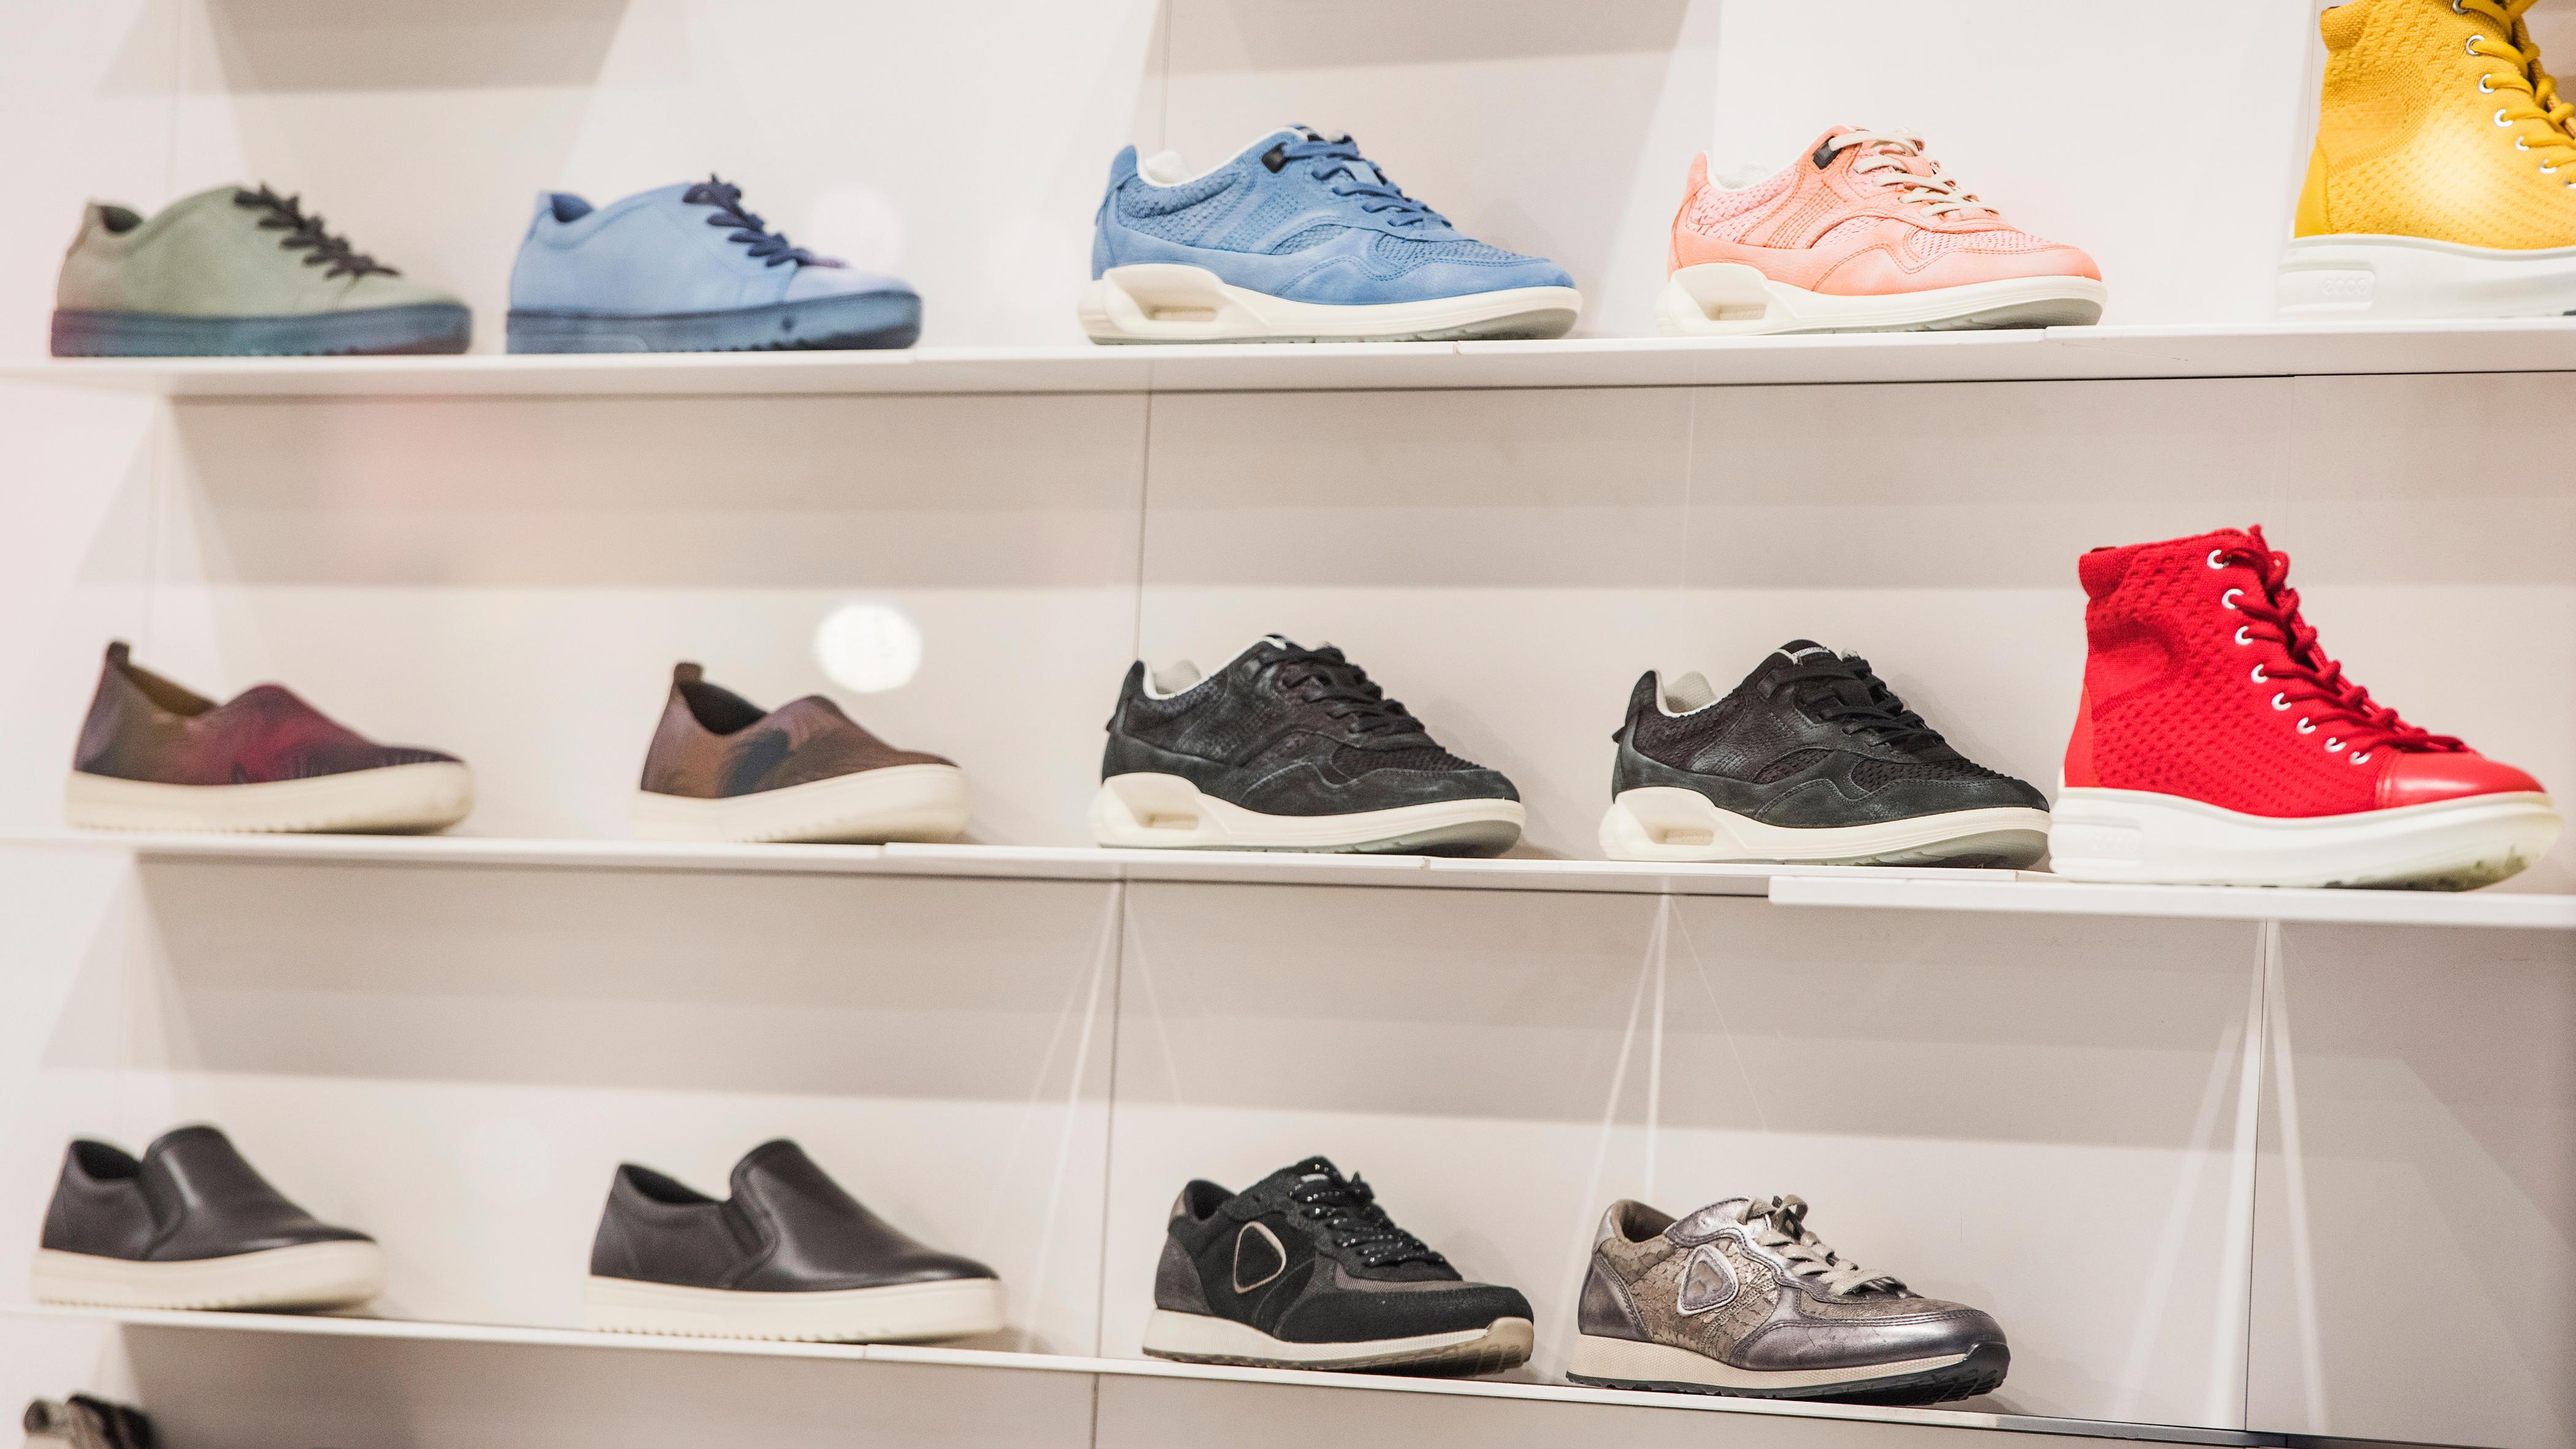 London's Coolest Independent Shoe Shops